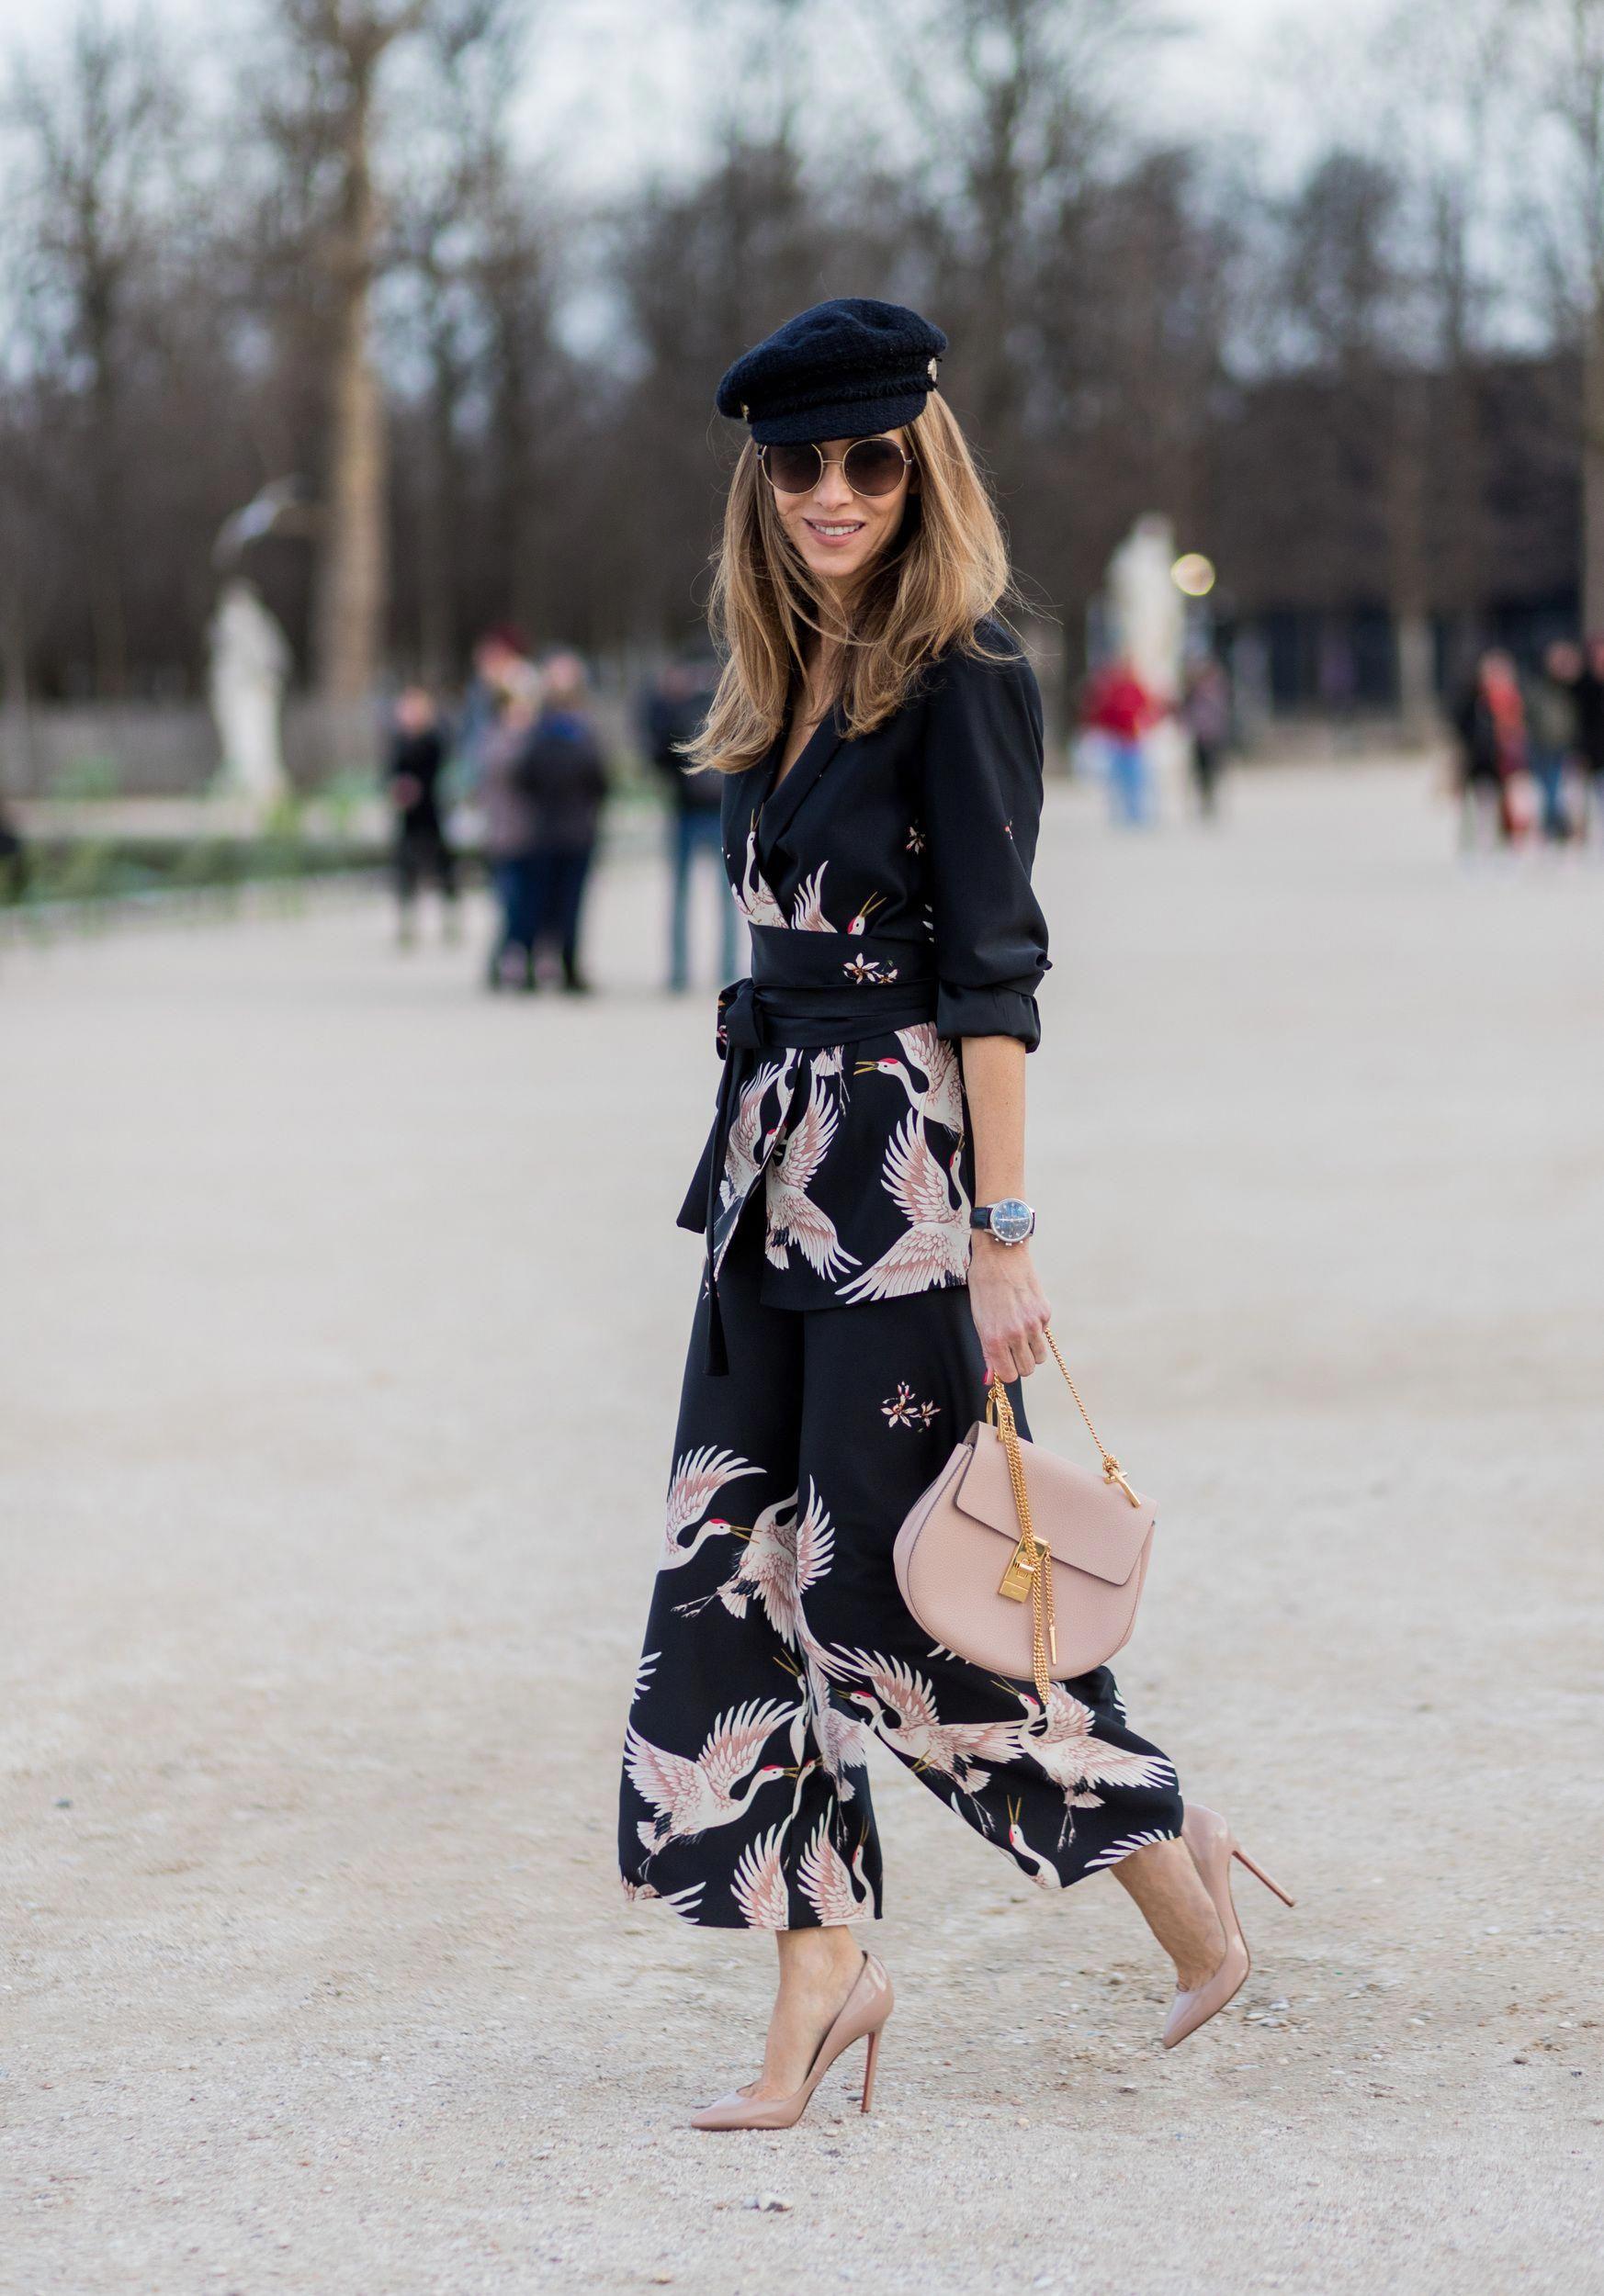 ad549c8d084 ChristianLouboutin | Blog stuff in 2019 | Pinterest | Fashion, Style ...